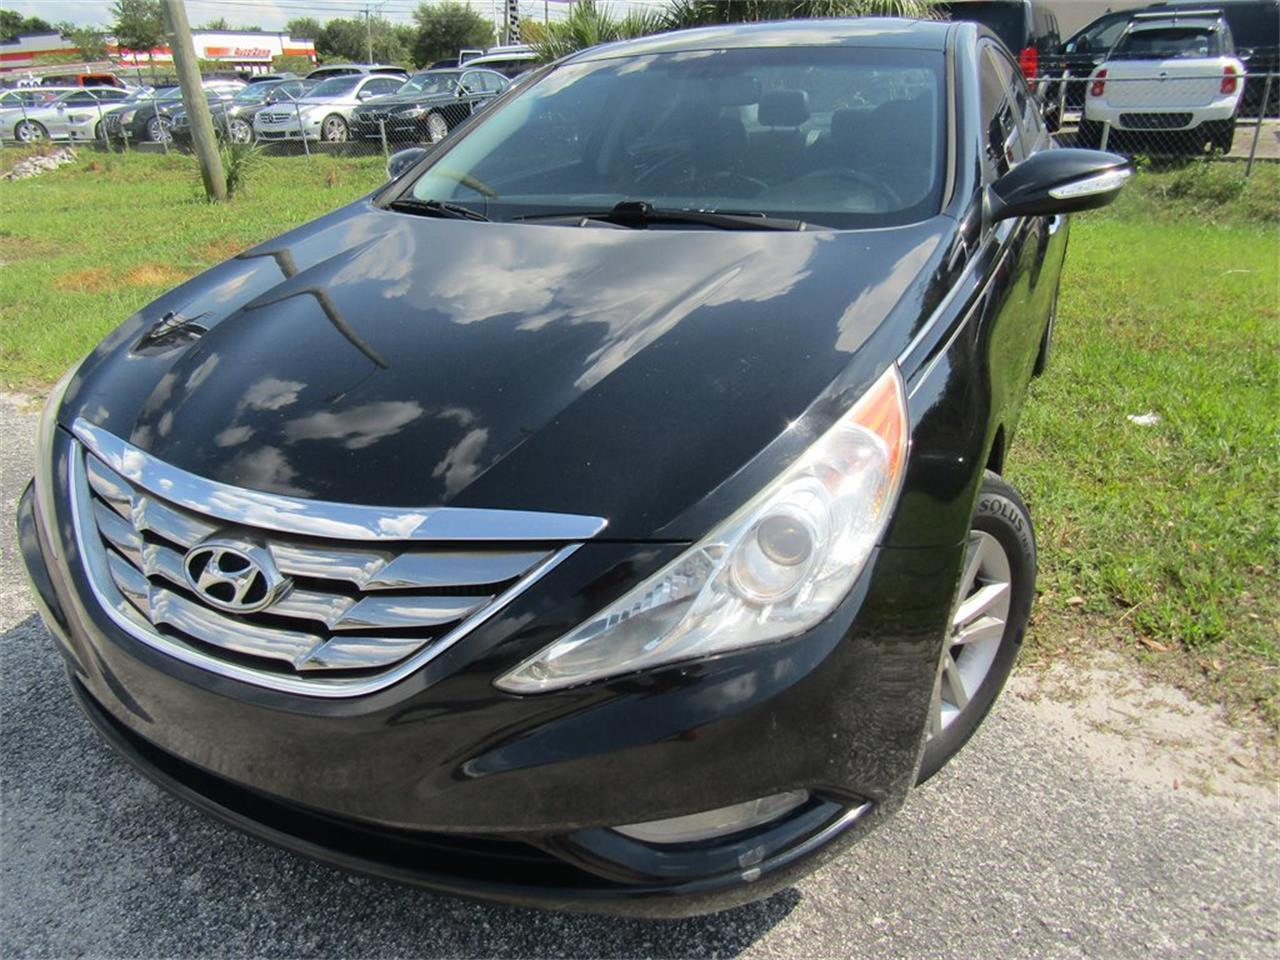 2011 Hyundai Sonata For Sale >> For Sale 2011 Hyundai Sonata In Orlando Florida